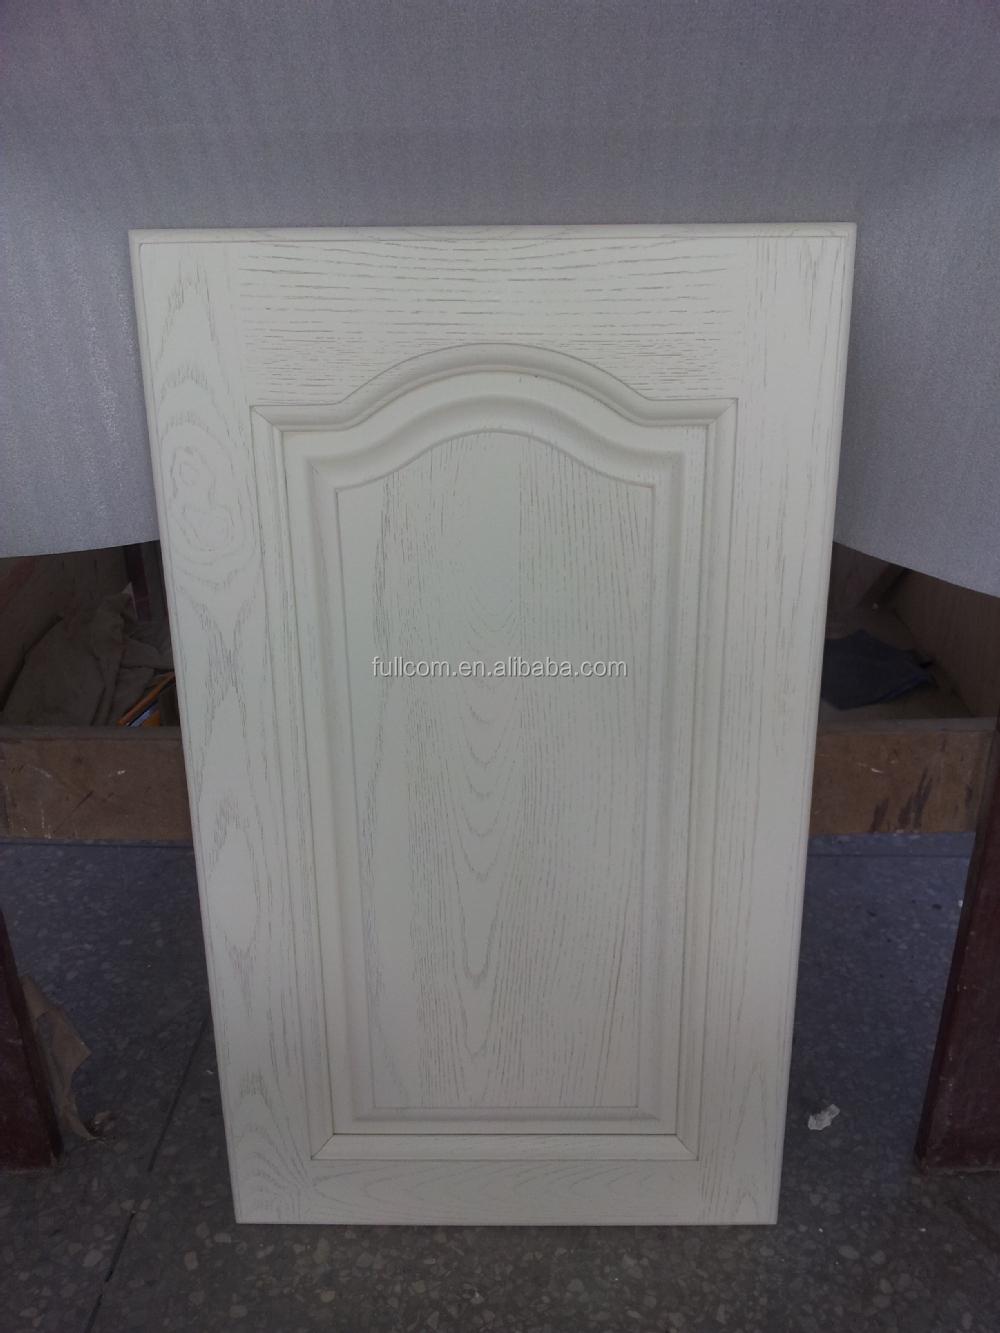 Frêne Blanc Armoires De Cuisine Porte En Bois - Buy Porte En Bois ...